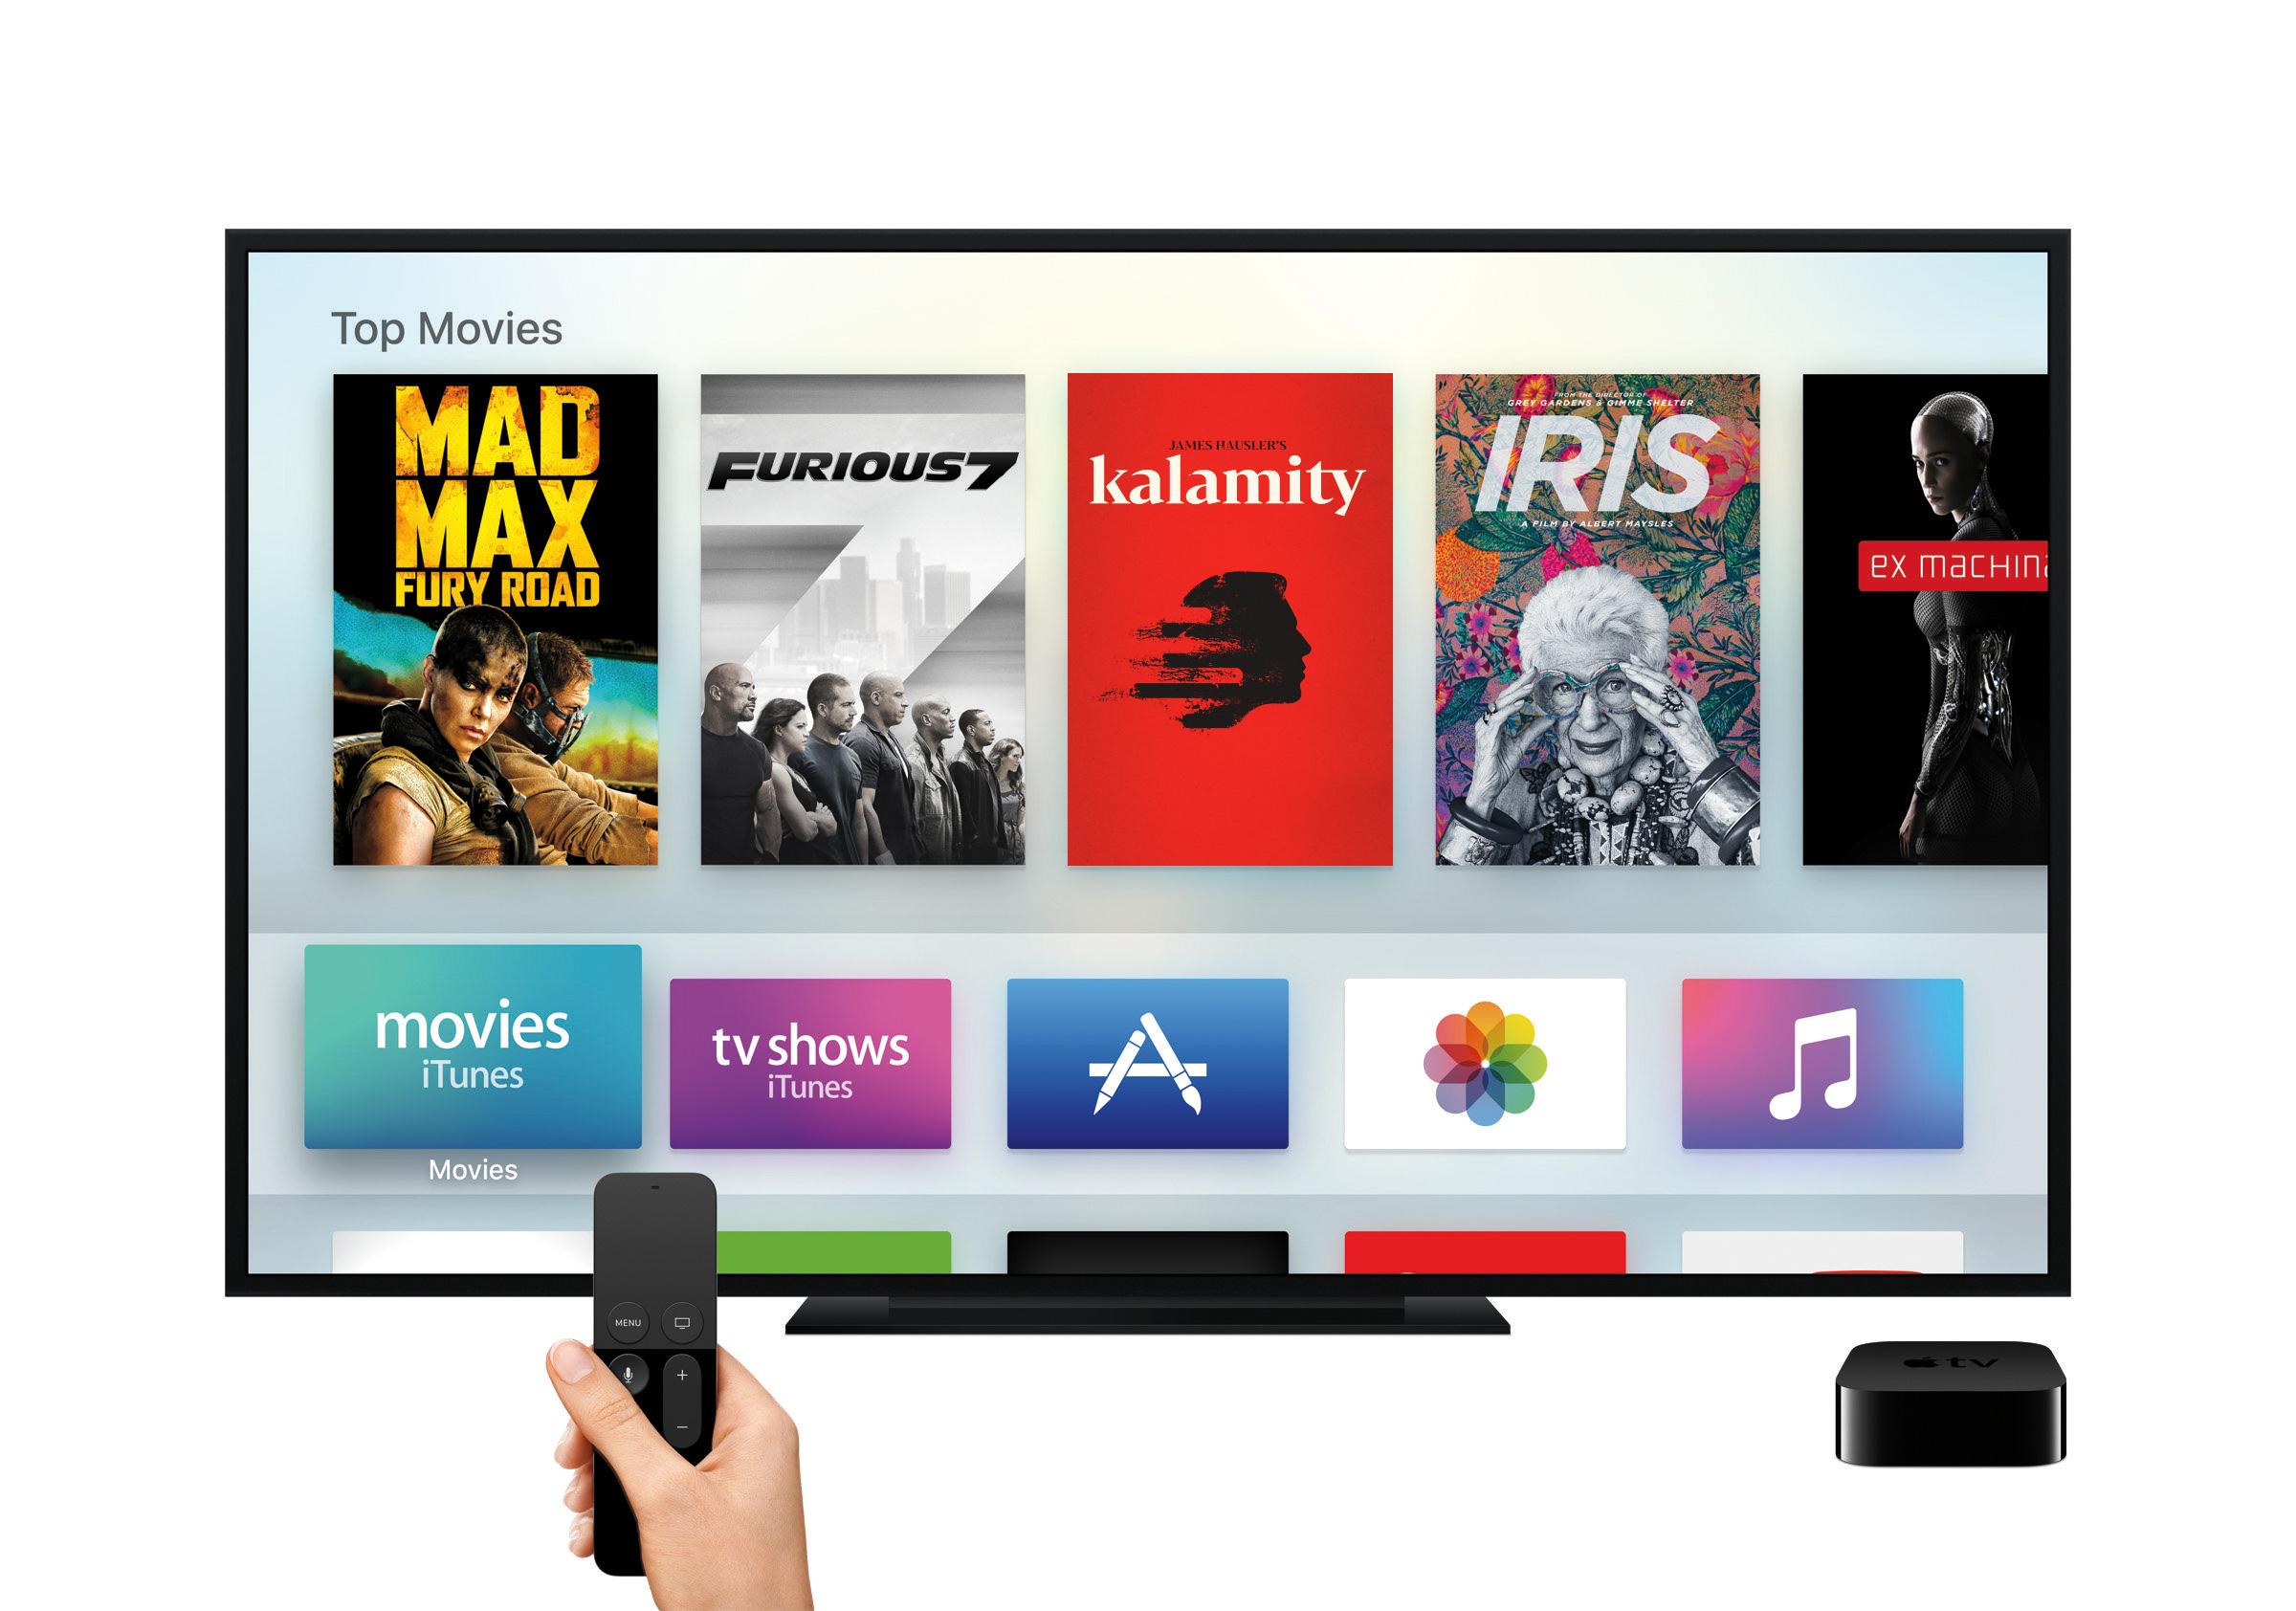 apple-tv selection screen01.jpg